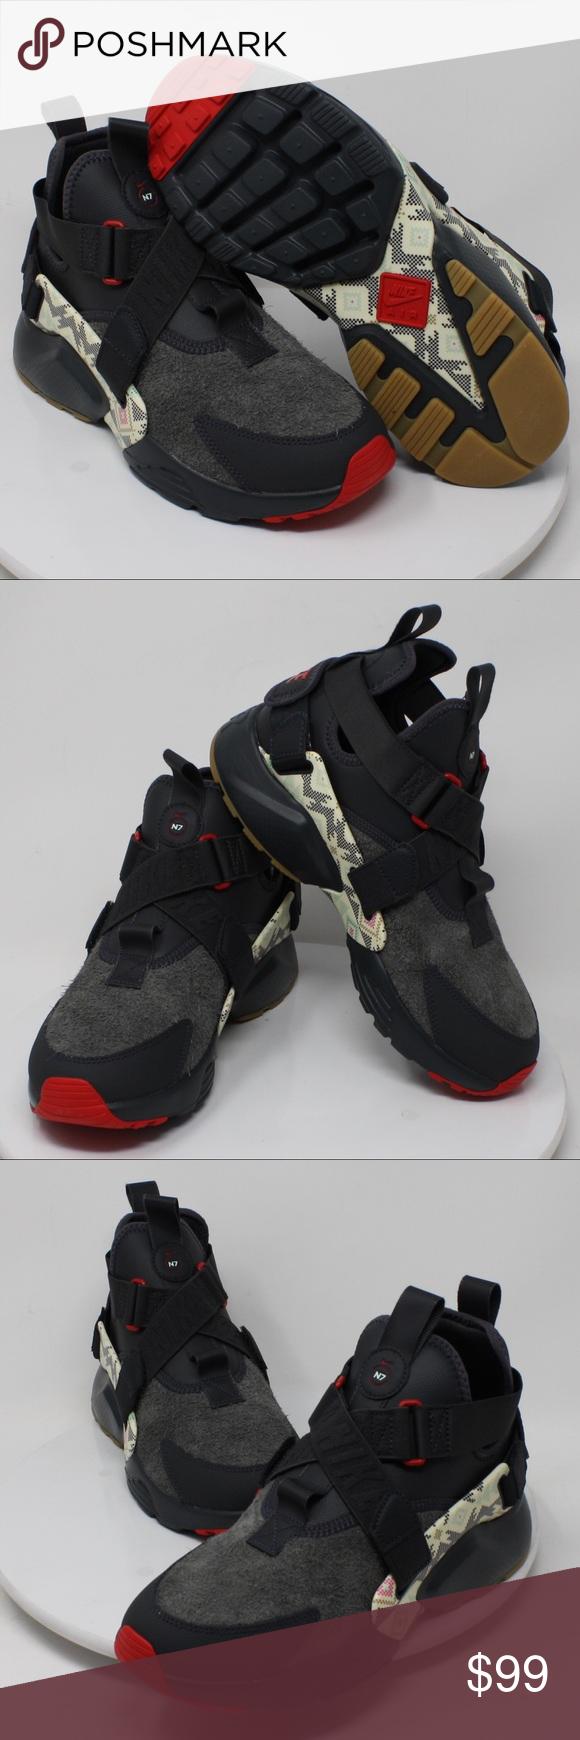 separation shoes ef2f2 5fd06 NIKE AIR HUARACHE CITY UTILITY PRM N7 AT6170 001 Women s Nike